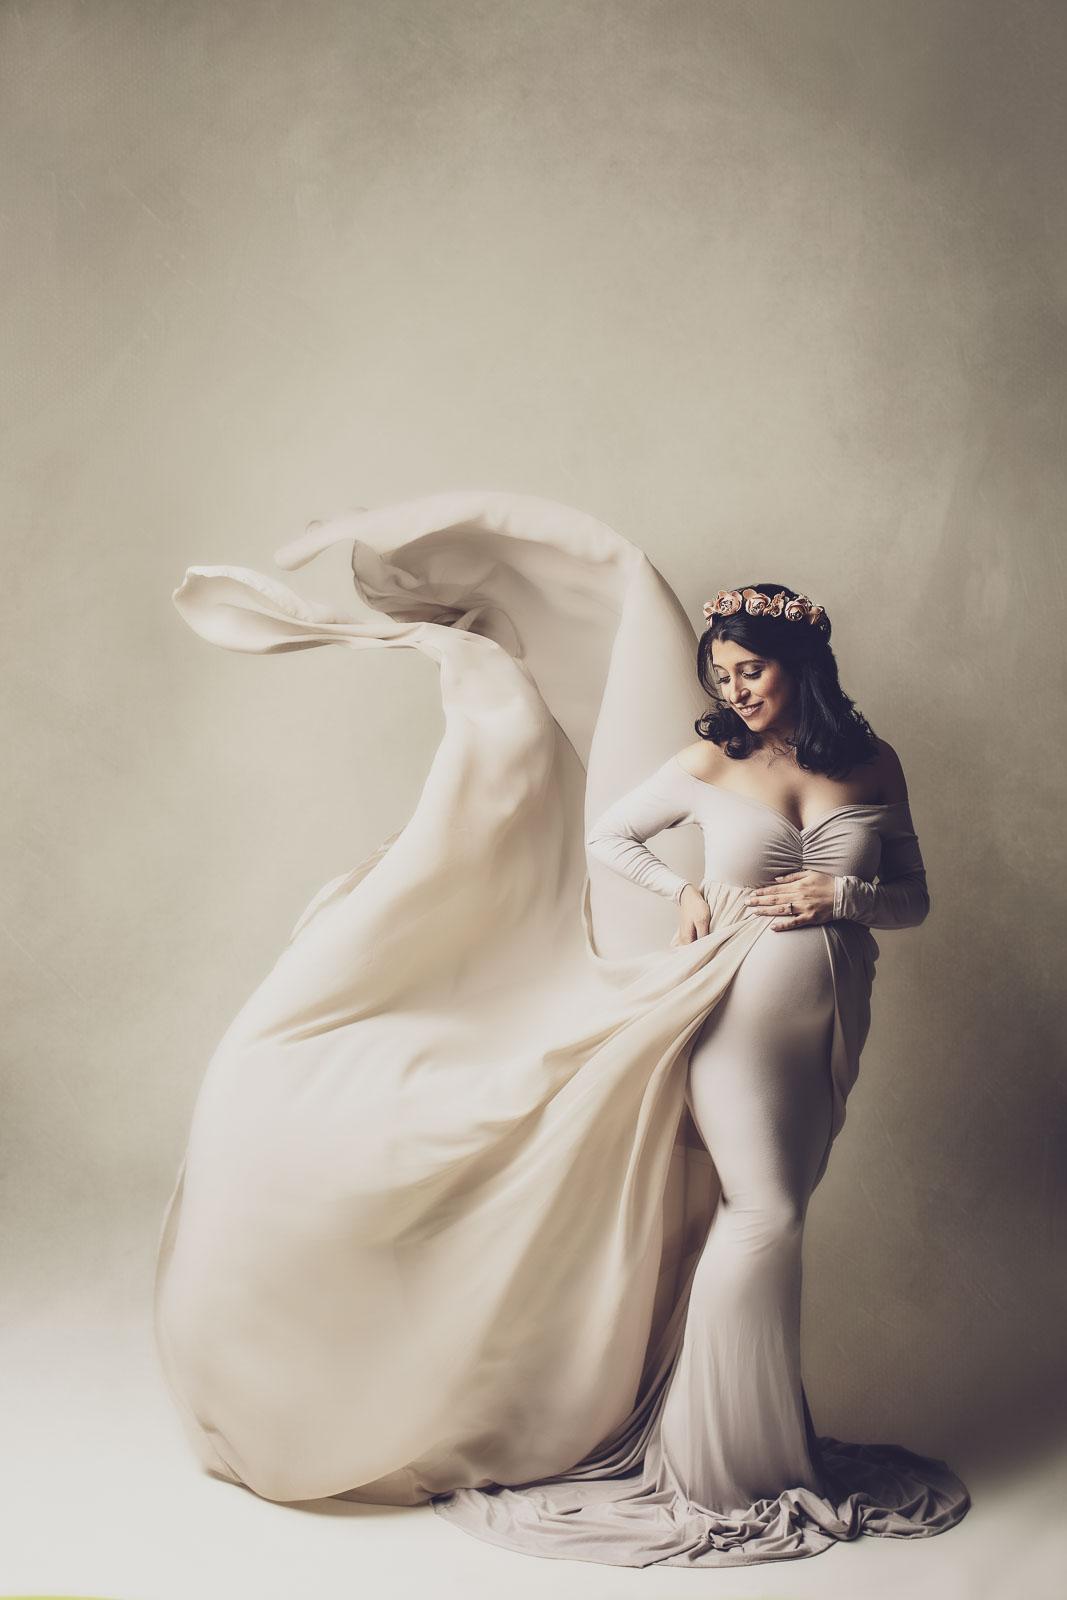 fabric toss creamy maternity photo